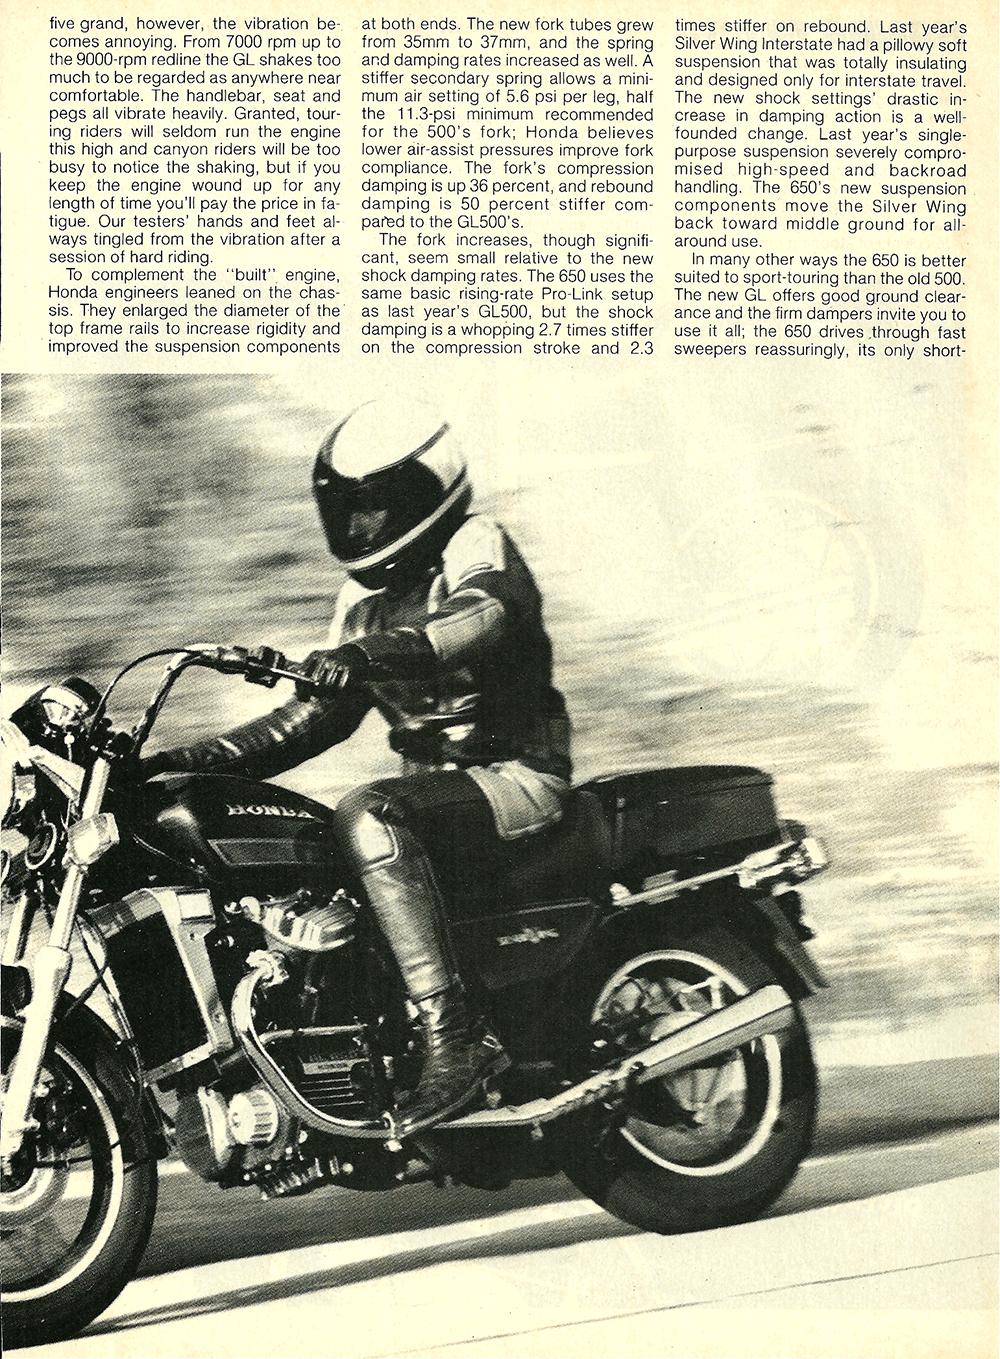 1983 Honda GL650 Silver Wing road test 5.jpg